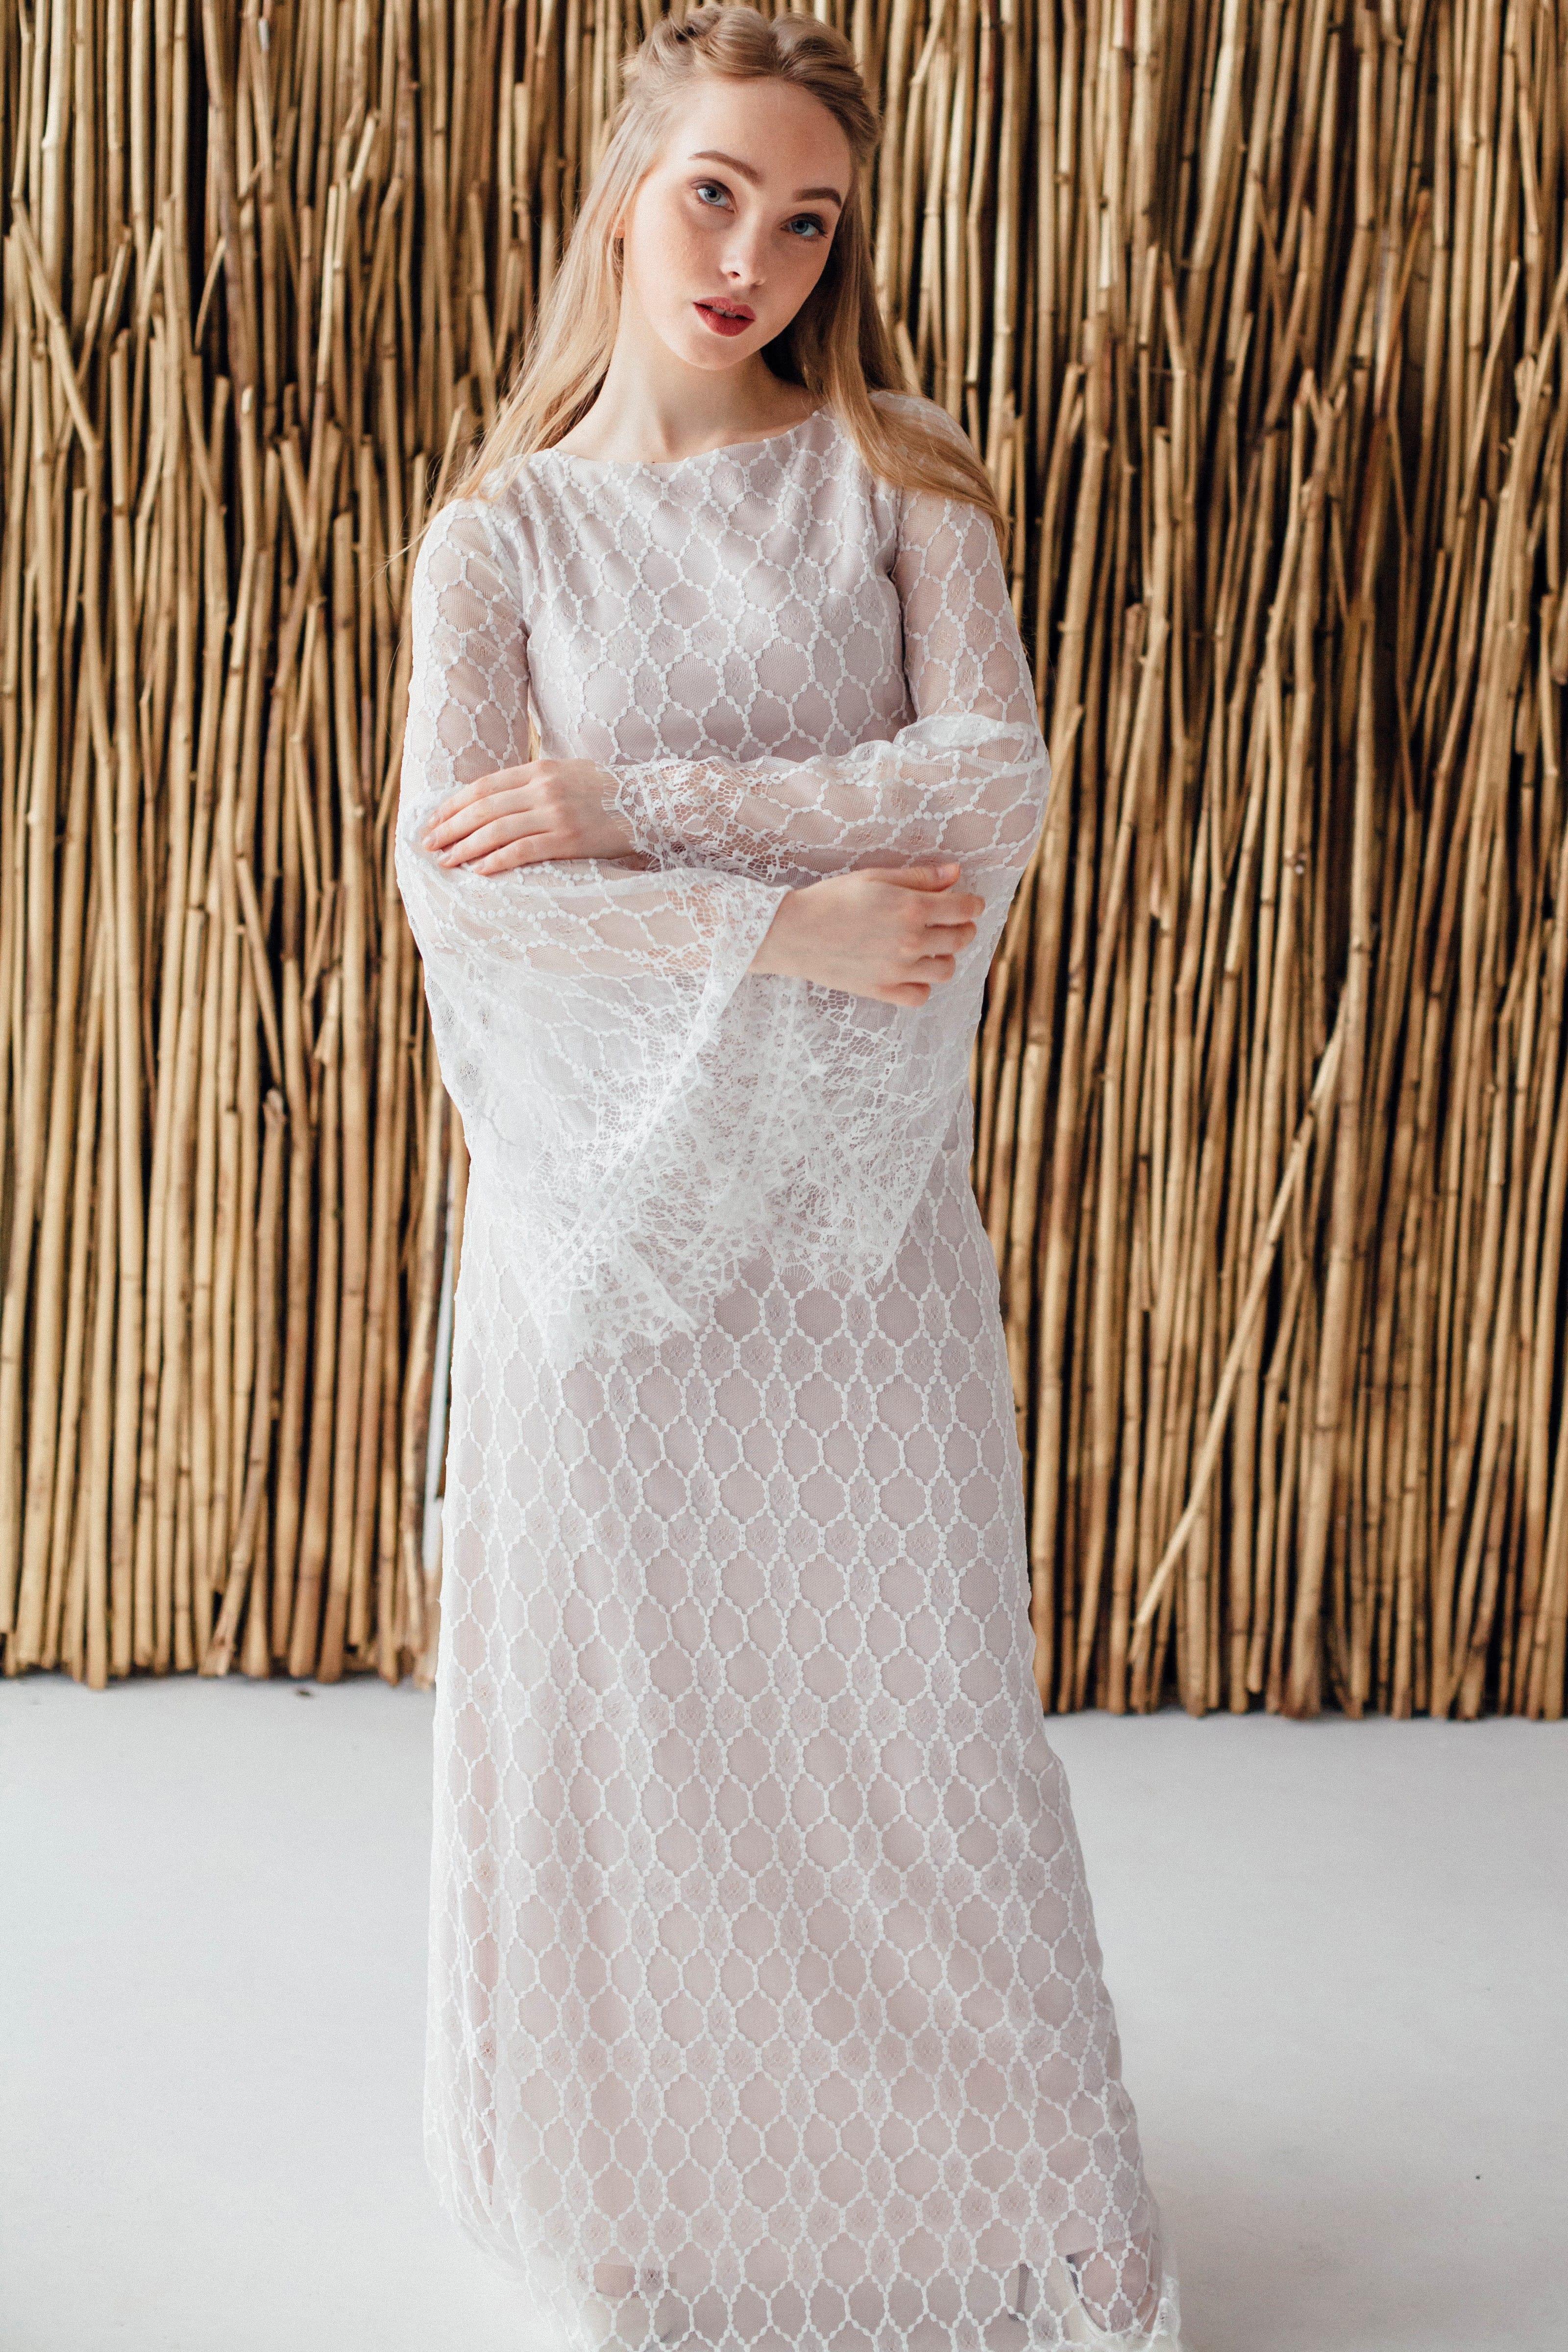 Свадебное платье EDISON, коллекция MAGIC OF TENDERNESS, бренд LORA SONG, фото 1